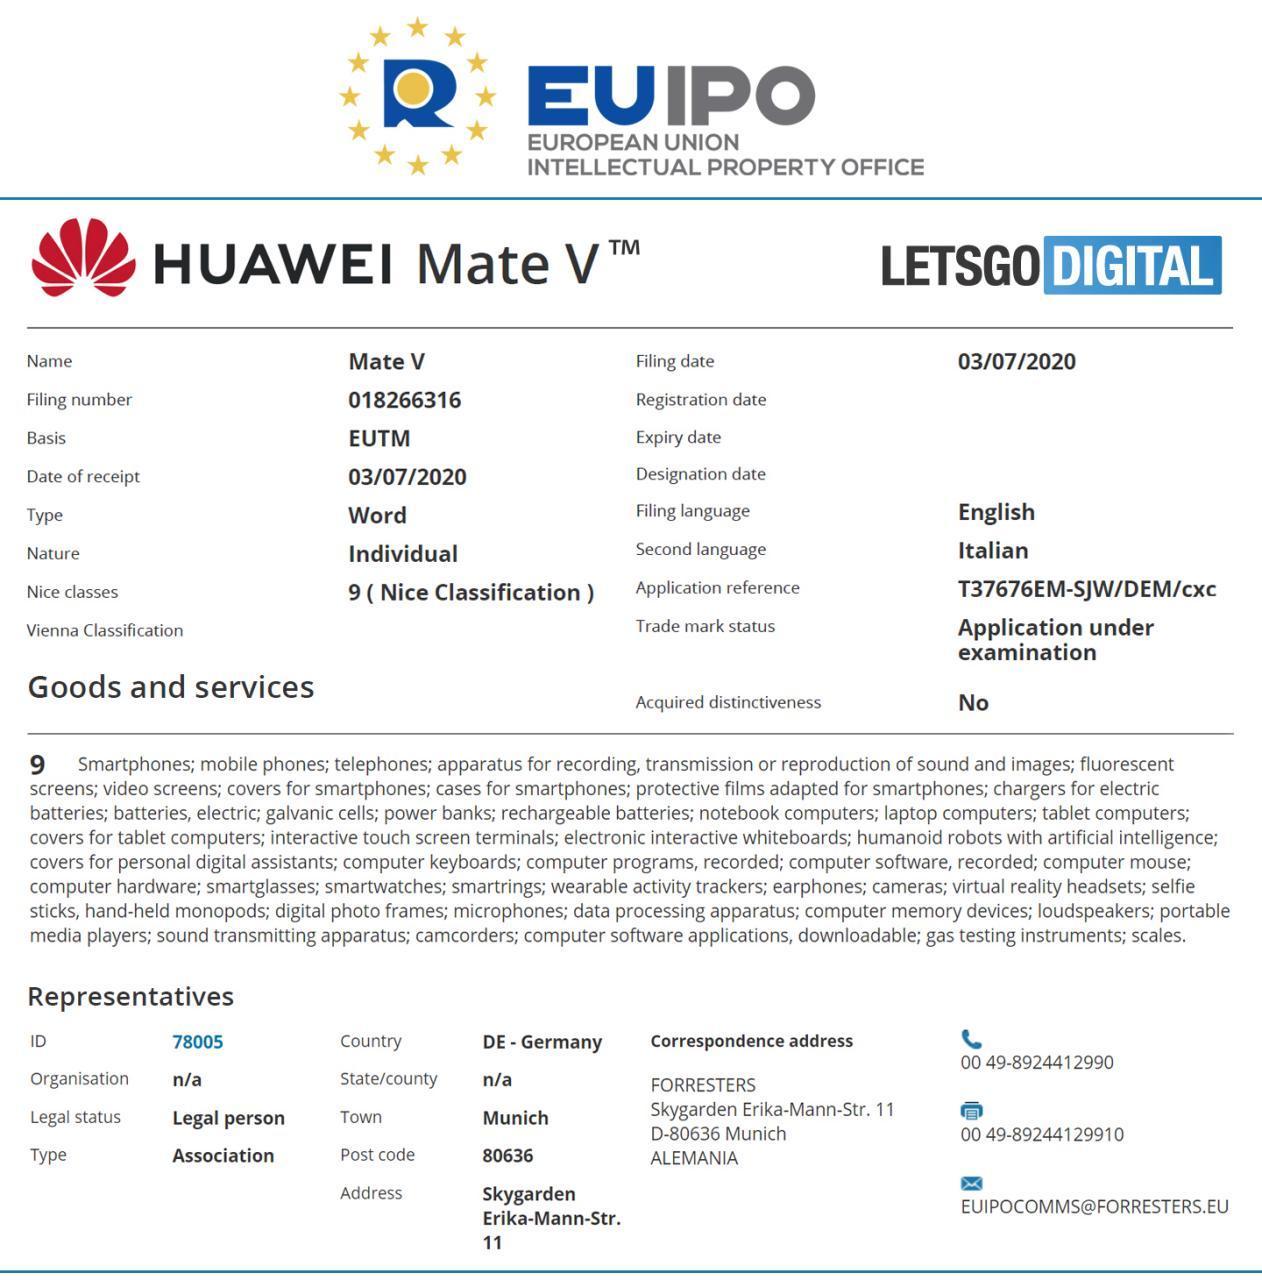 huawei-mate-v-trademark-1